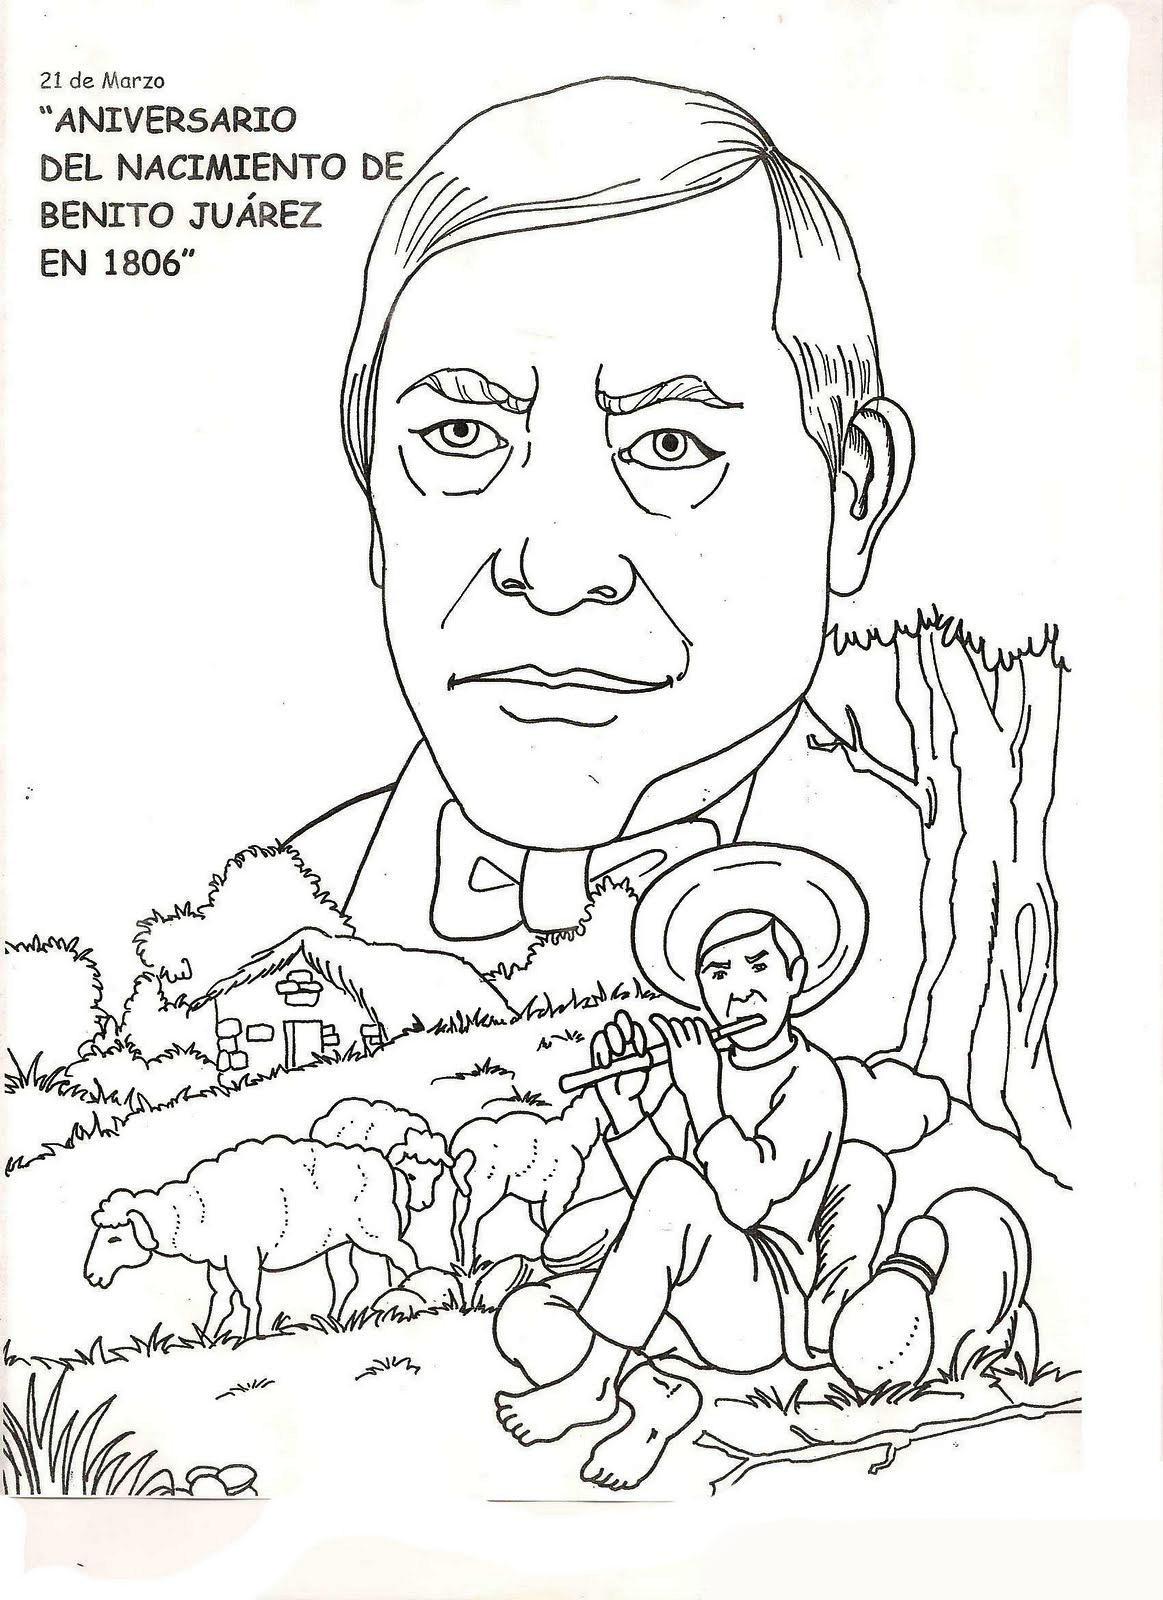 Dibujos de Benito Juarez para colorear JPG PNG by GianFerdinand